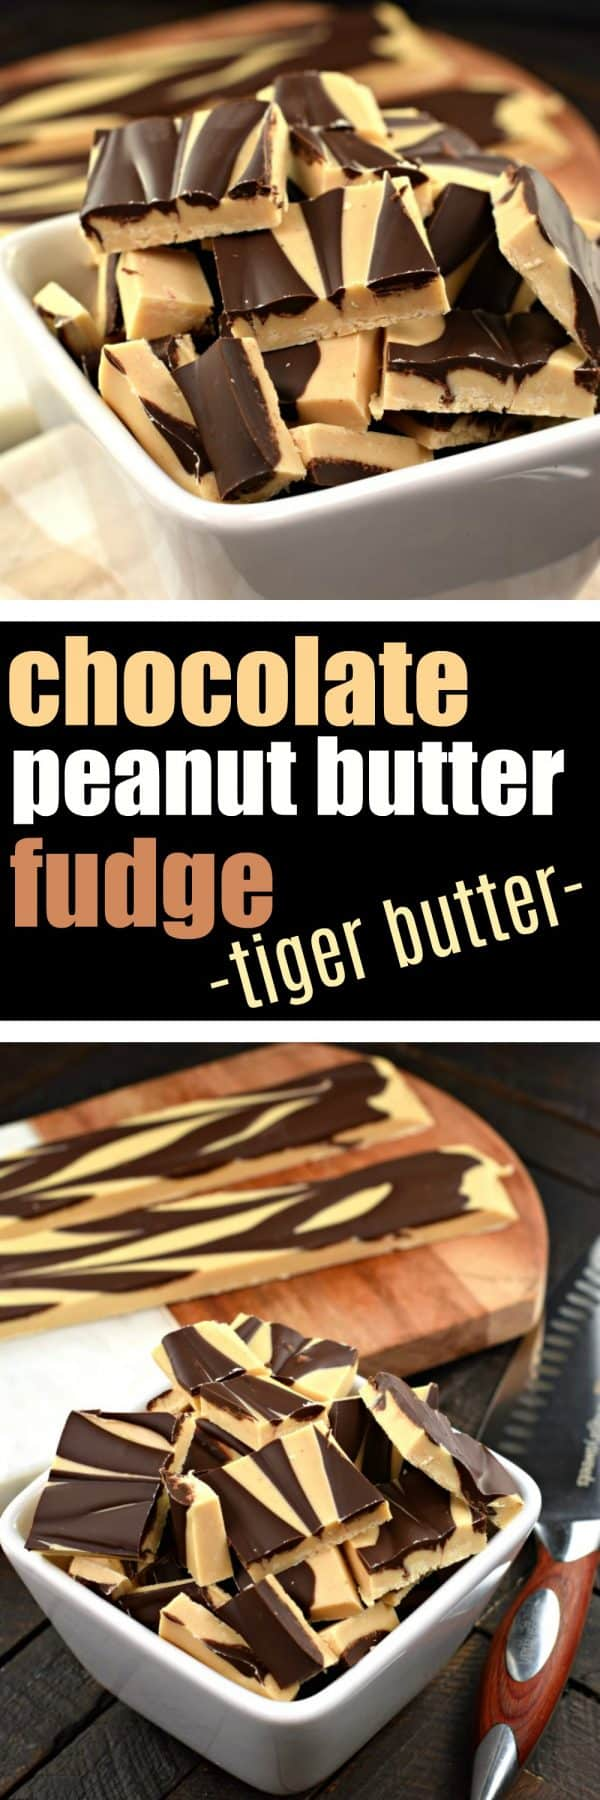 chocolate peanut butter fudge, chocolate, peanut butter, fudge, candy, white chocolate, tiger butter, homemade, swirls